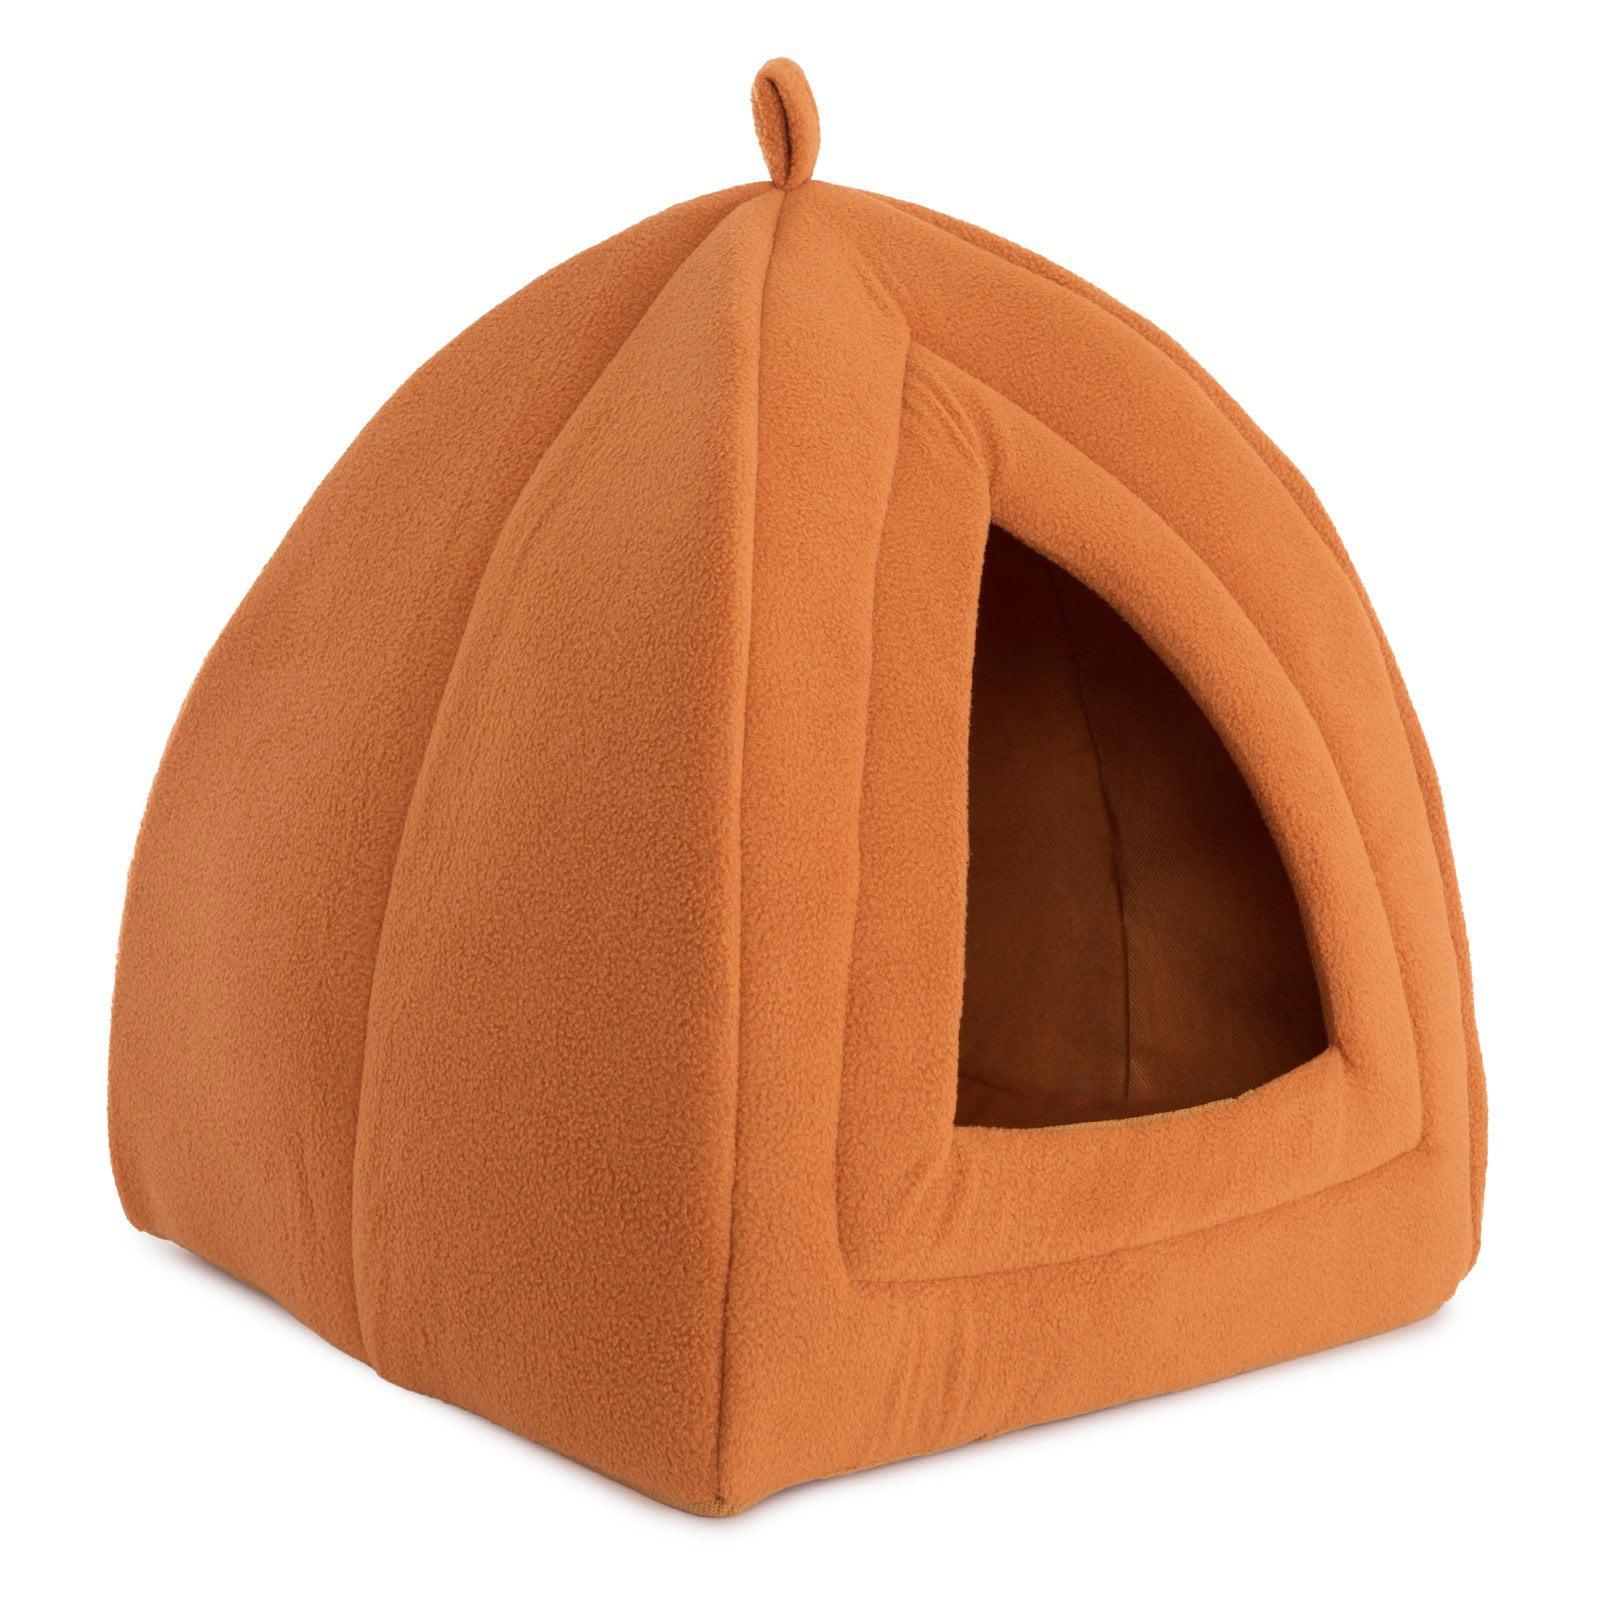 Petmaker Cozy Kitty Tent Igloo Plush Cat Bed Walmart Com